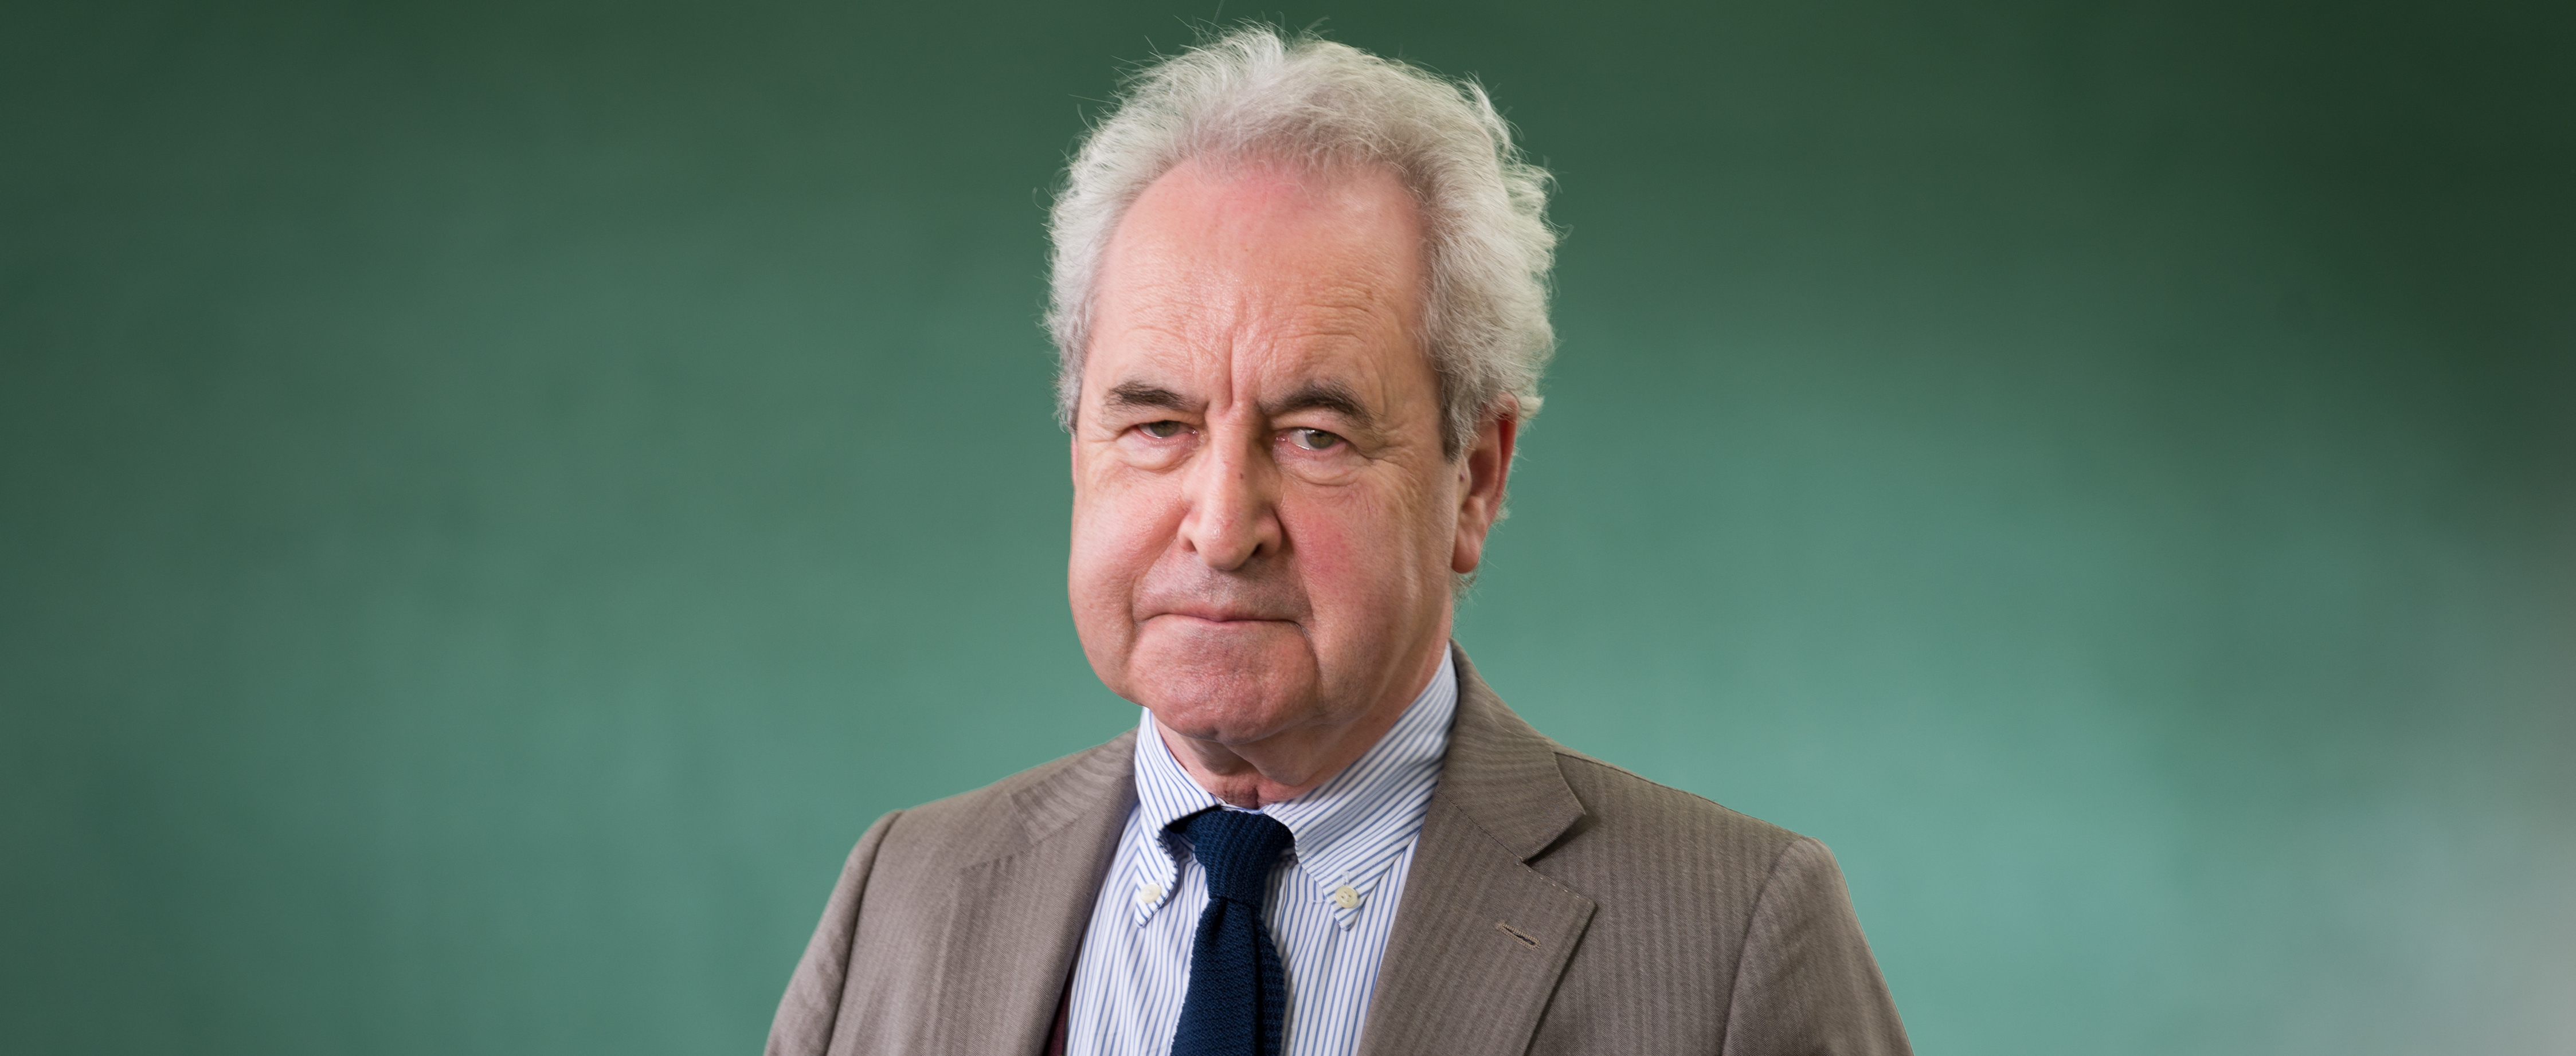 John Banville Says He Hates the 'Woke Movement'